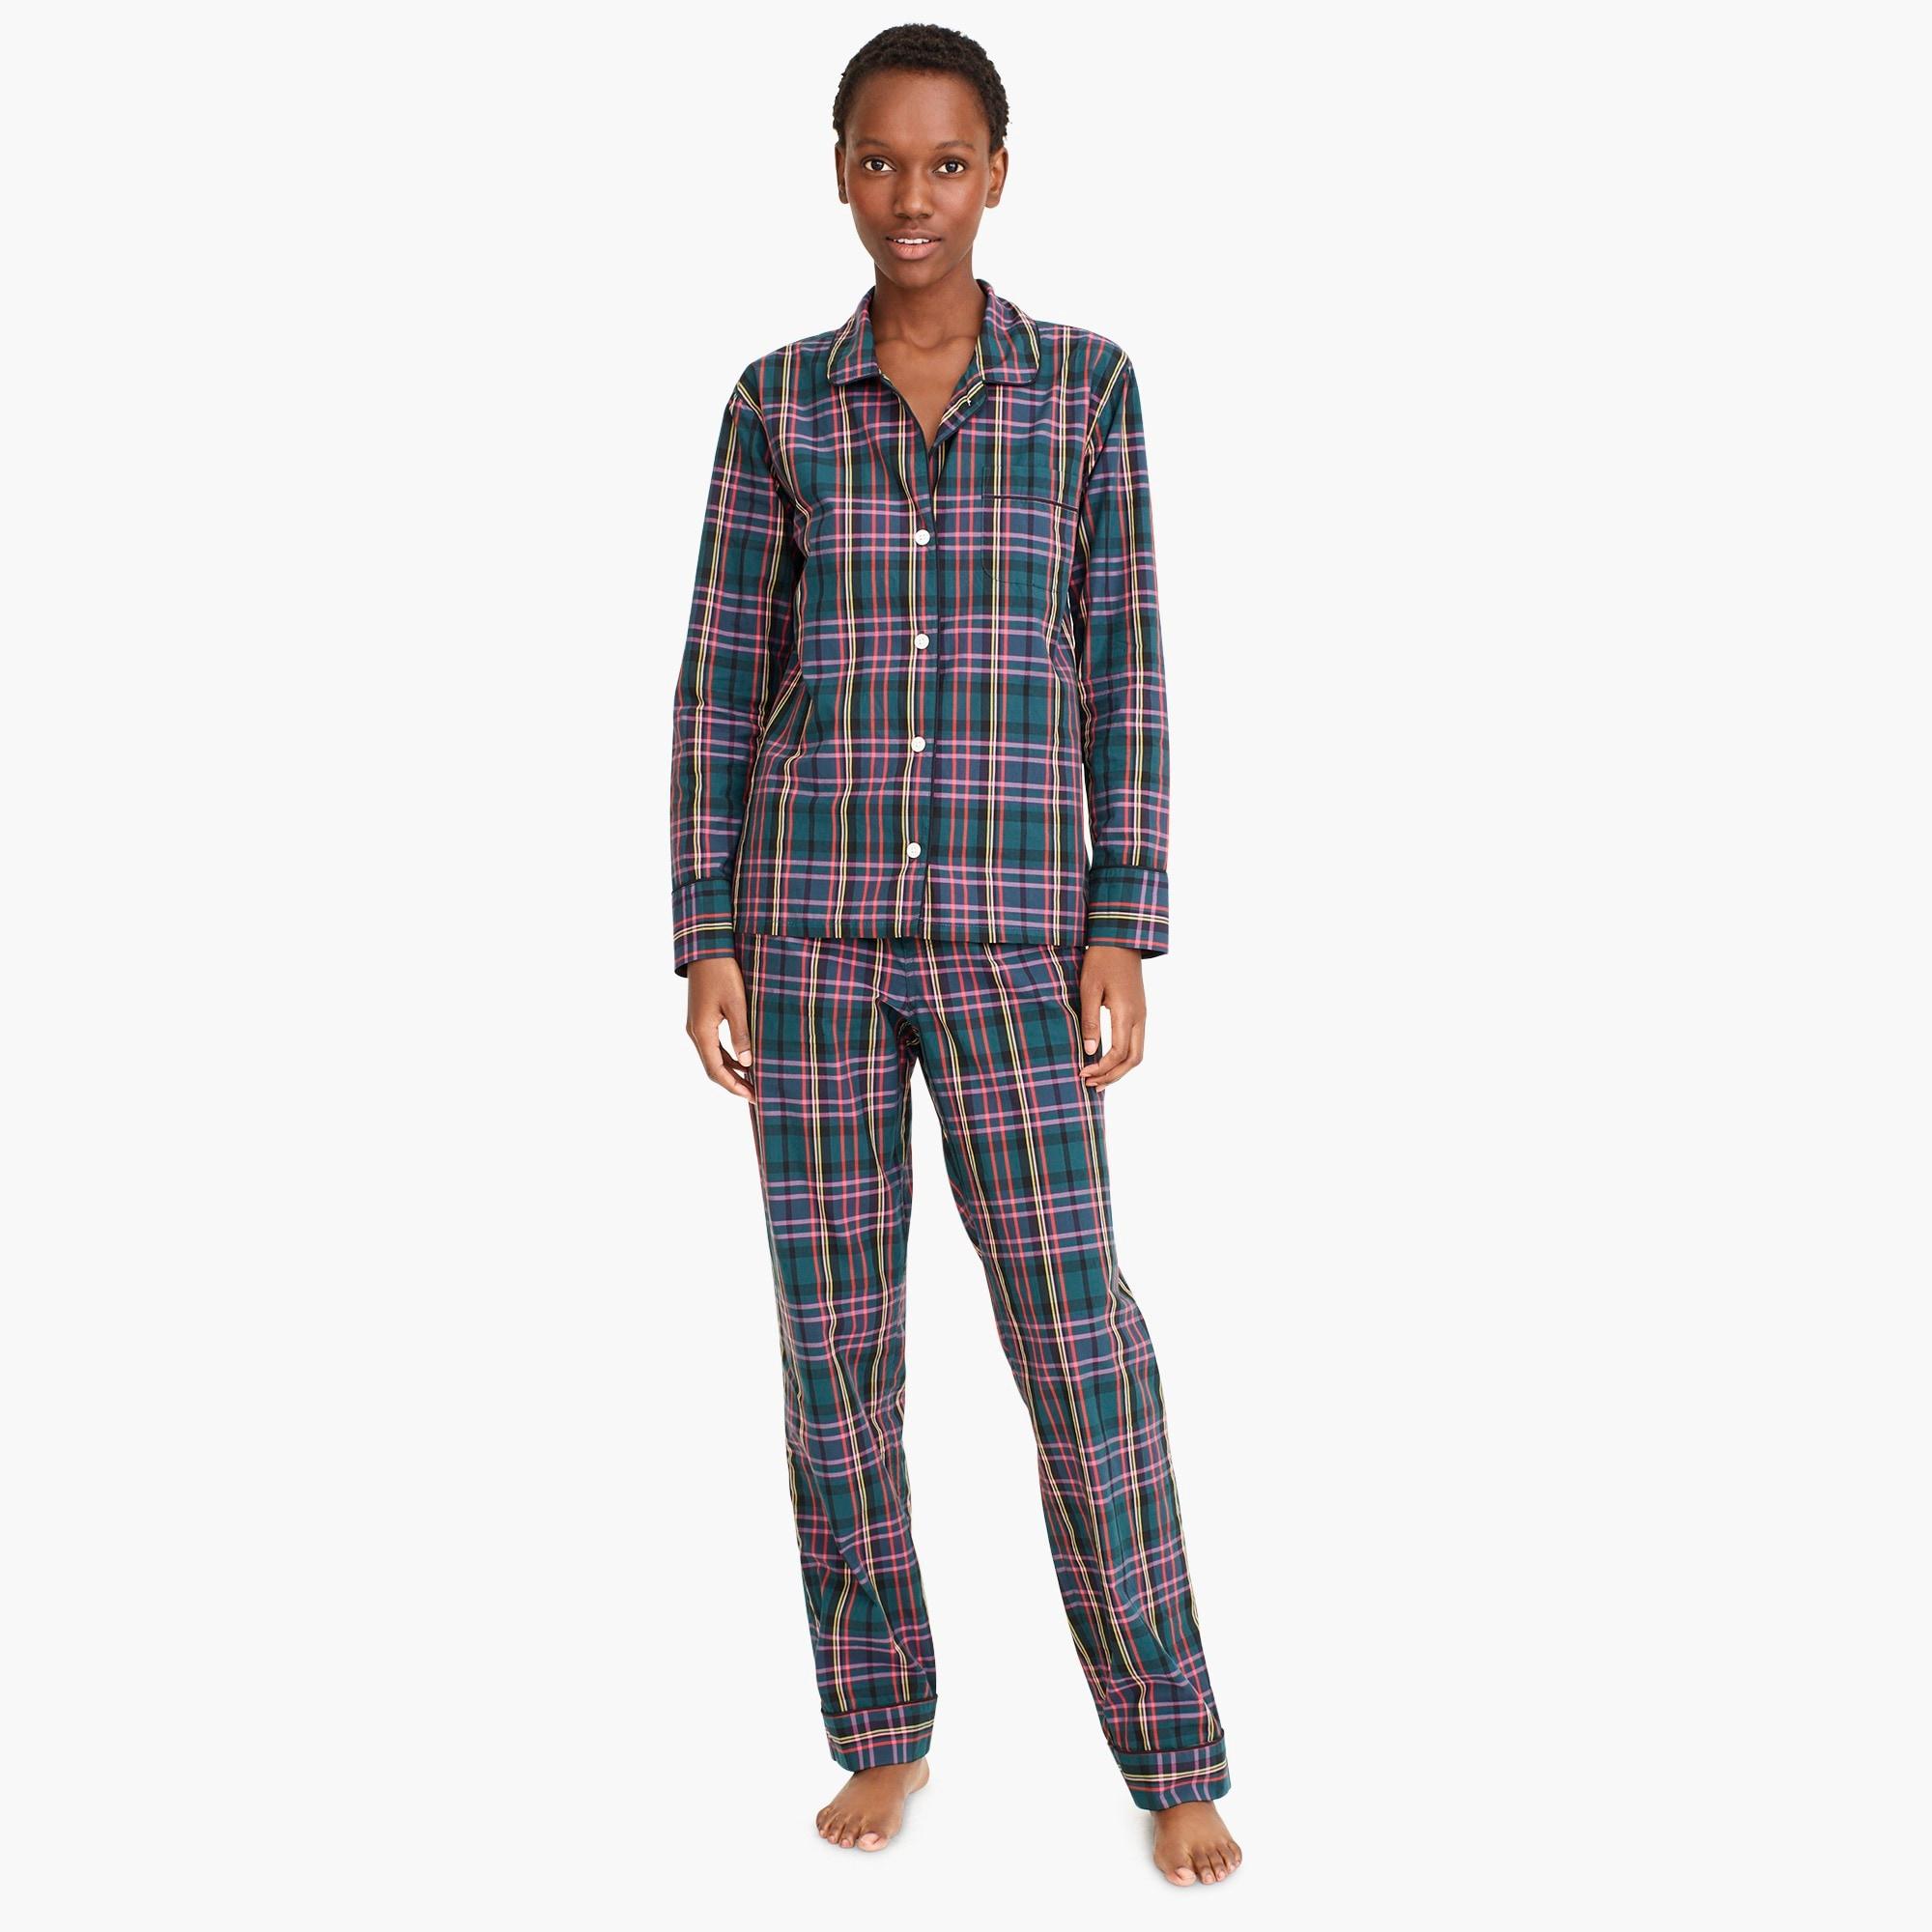 Image 3 for Vintage pajama set in J.Crew Signature Tartan